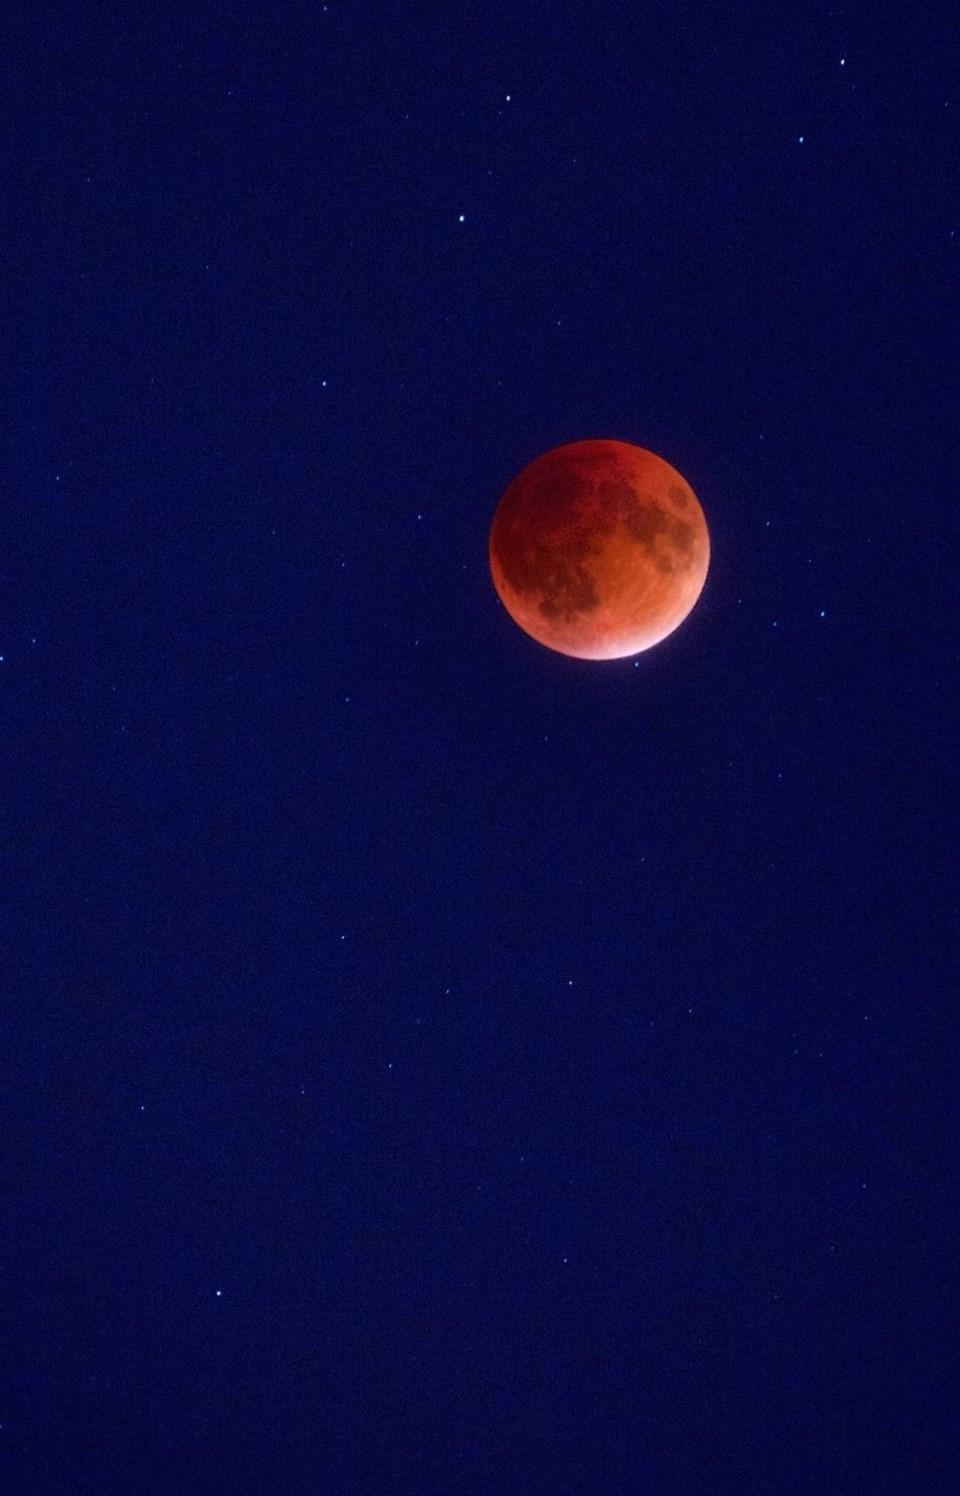 Ay Tutulması, 31 Ocak 2018, süper kanlı ay tutulması, mavi ay tutulması, burçlara etkisi